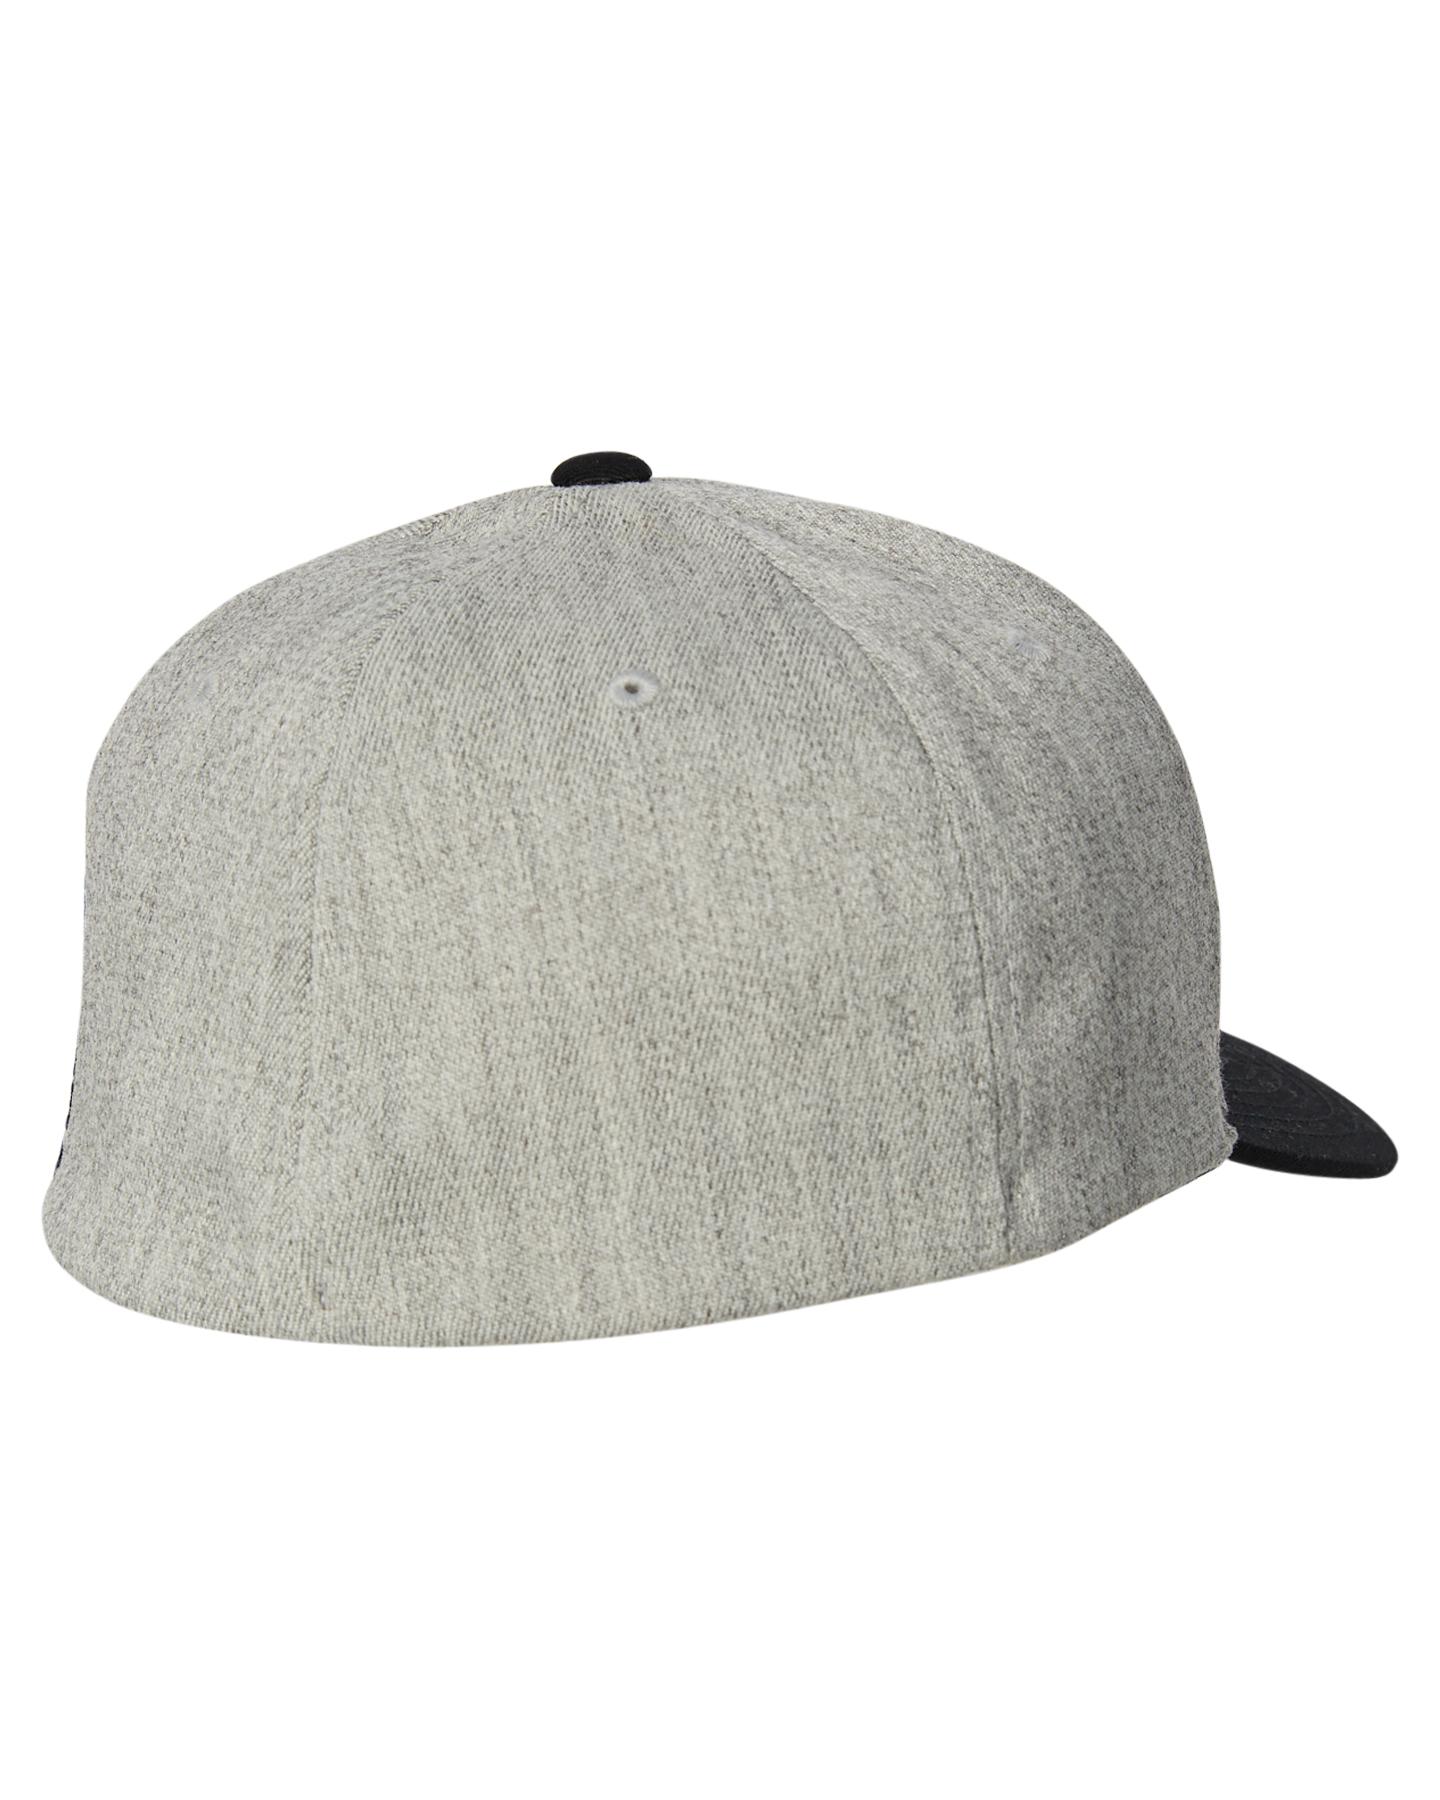 13be30f6fcd New Volcom Men s Full Stone Xfit Cap Cotton Fitted Elastane Black